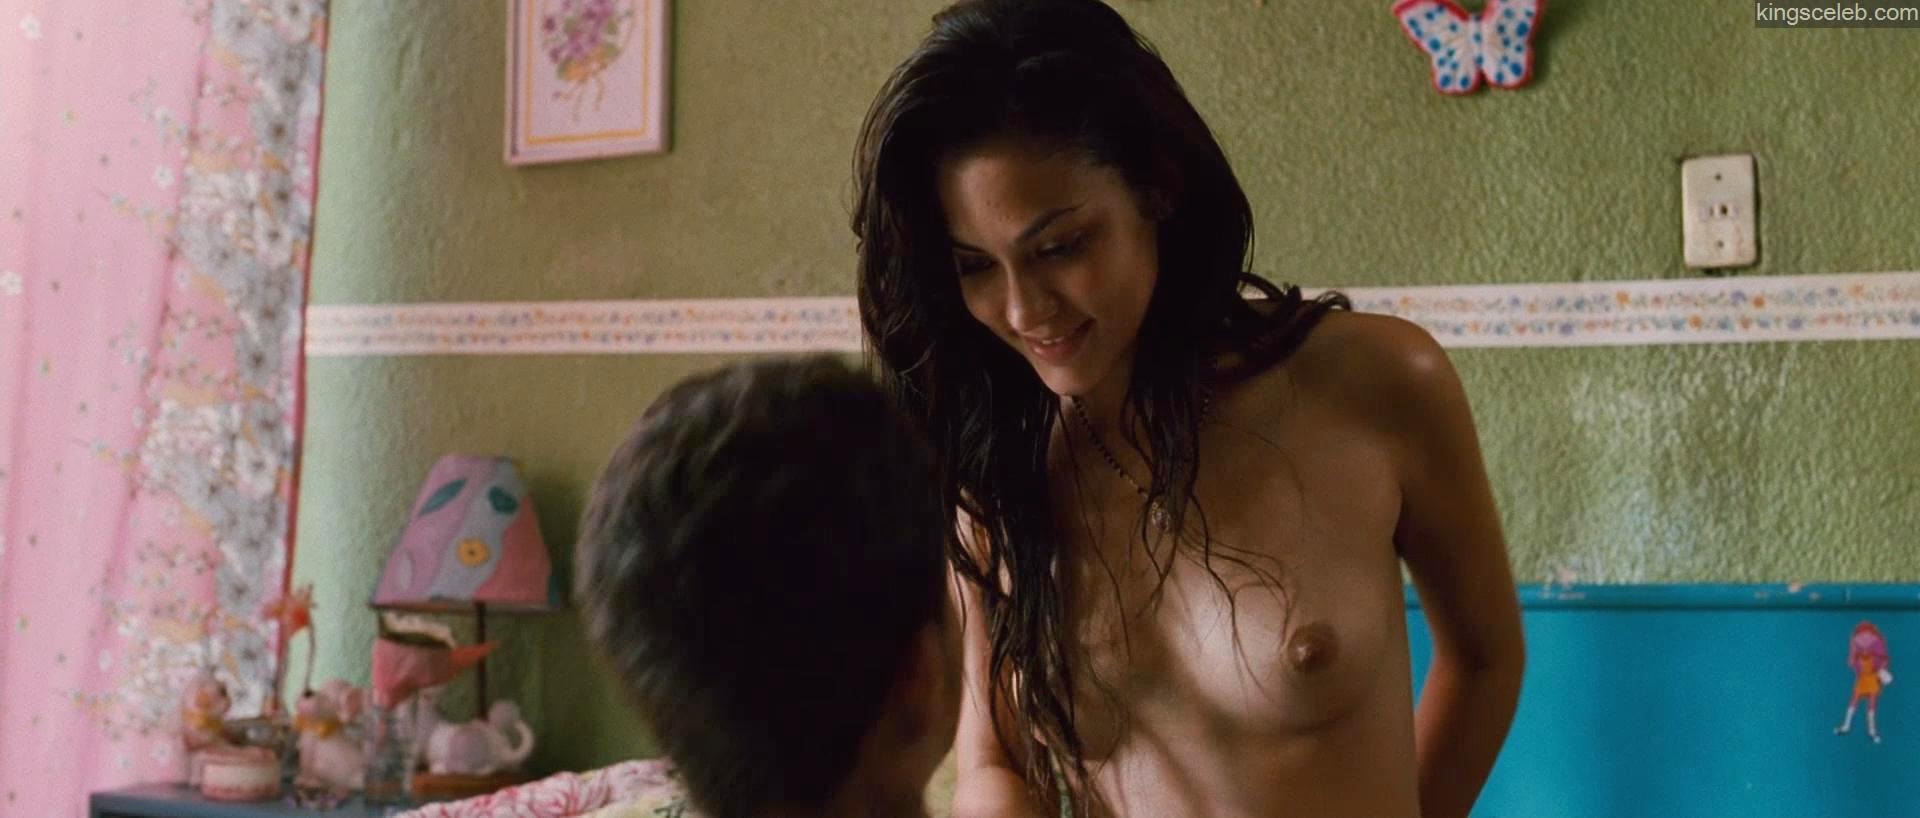 Diana andrea gonzalez desnuda